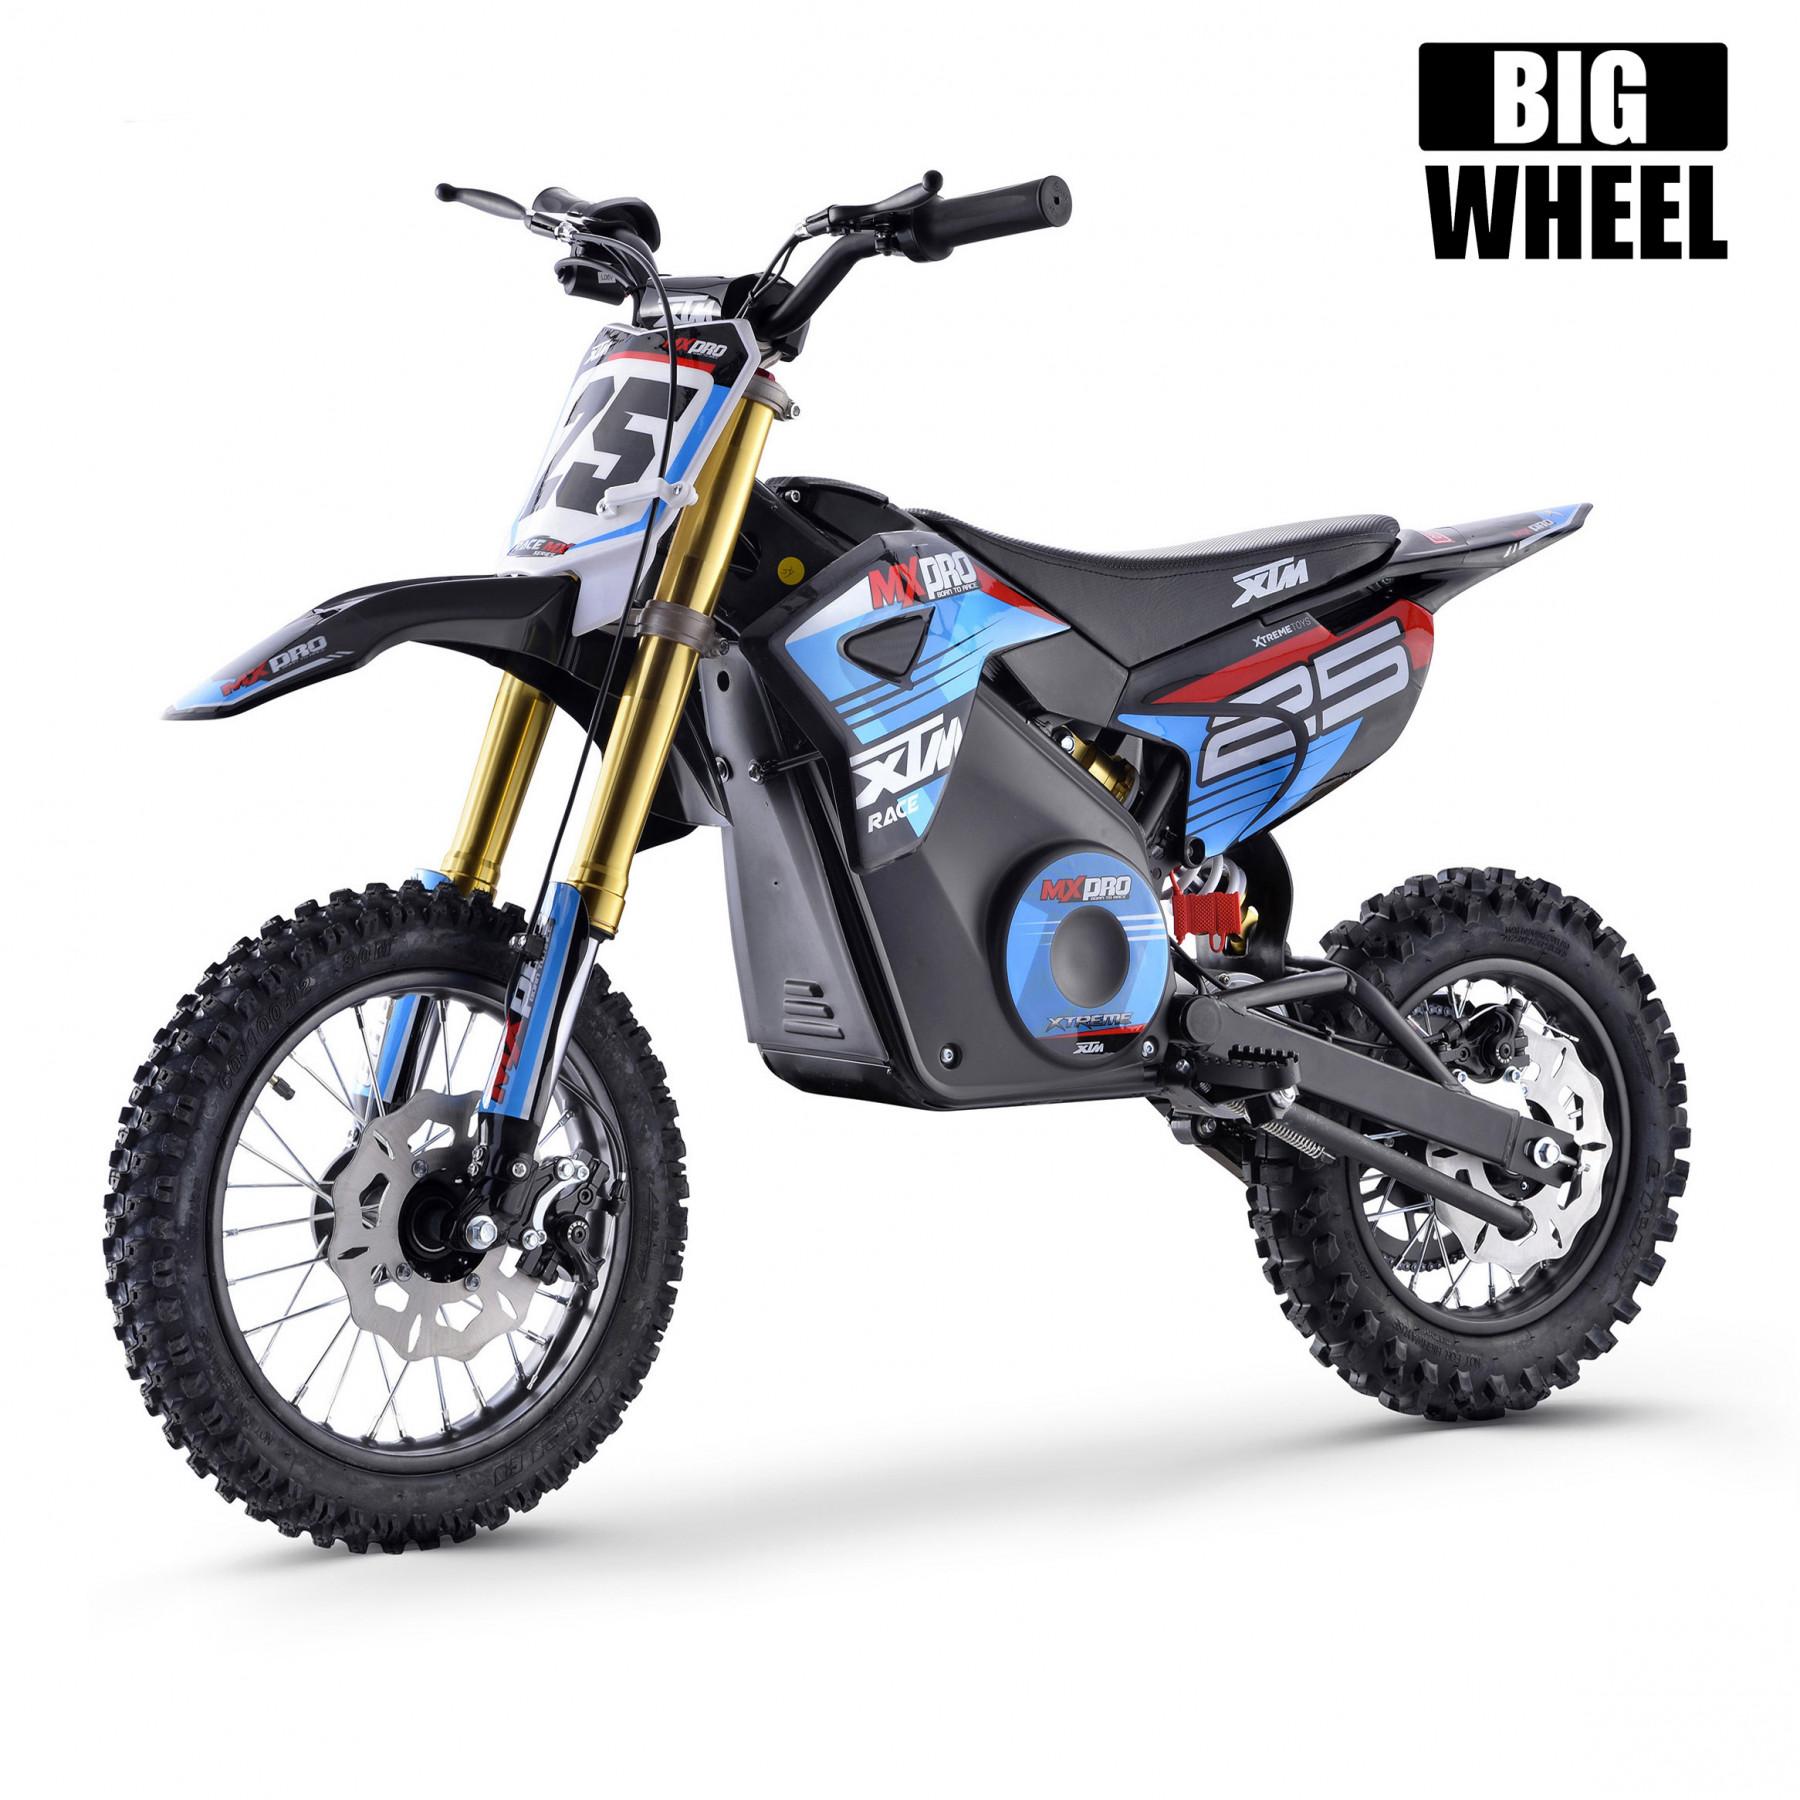 Xtm Mx Pro 48v 1300w Big Wheel Lithium Dirt Bike Blue